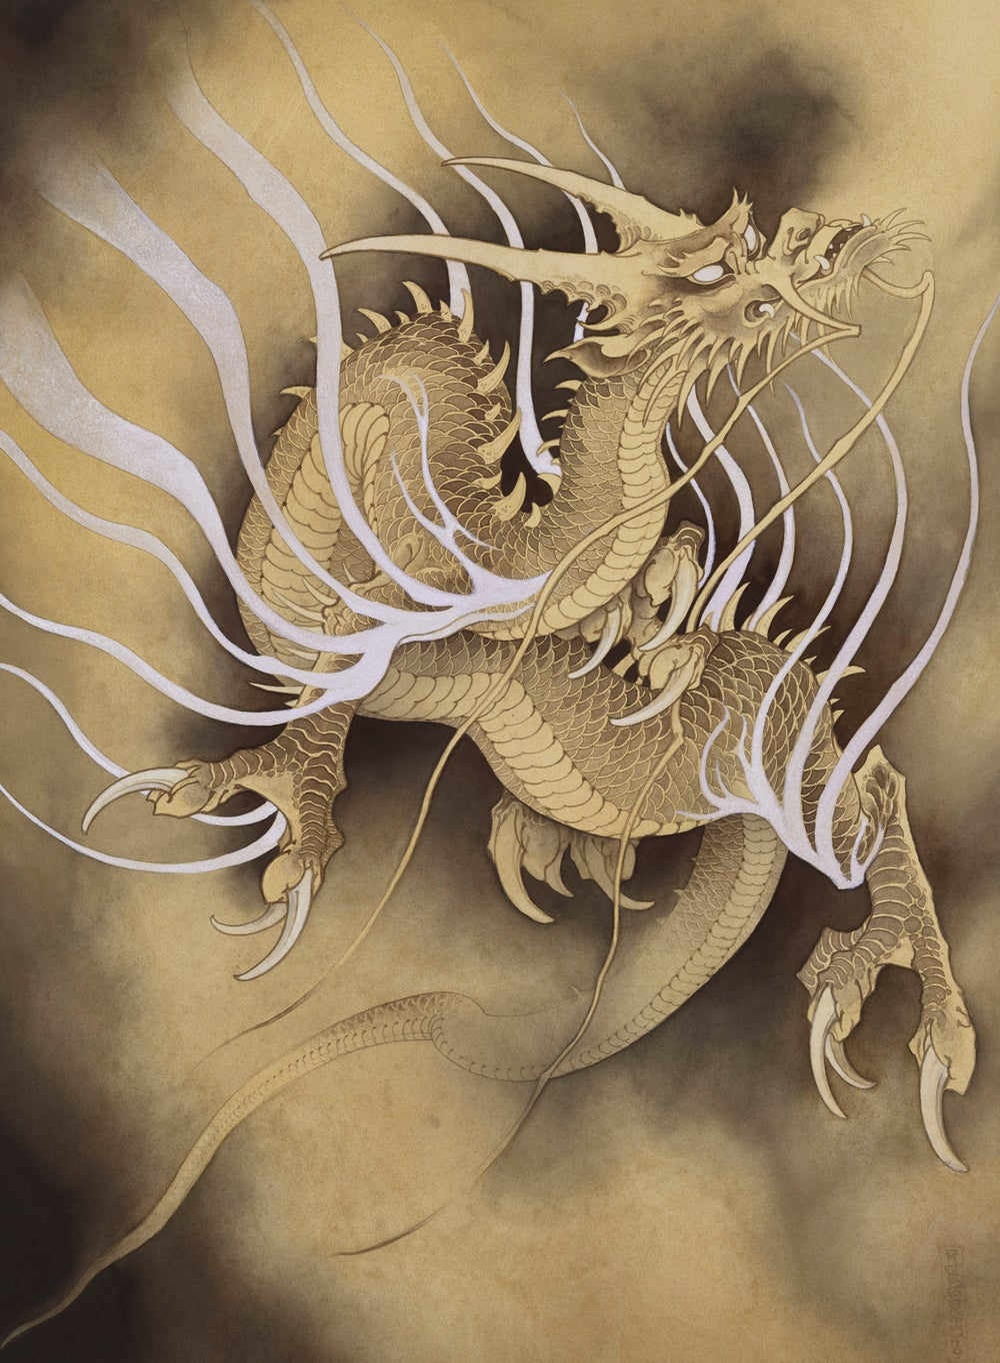 Dragon in mist